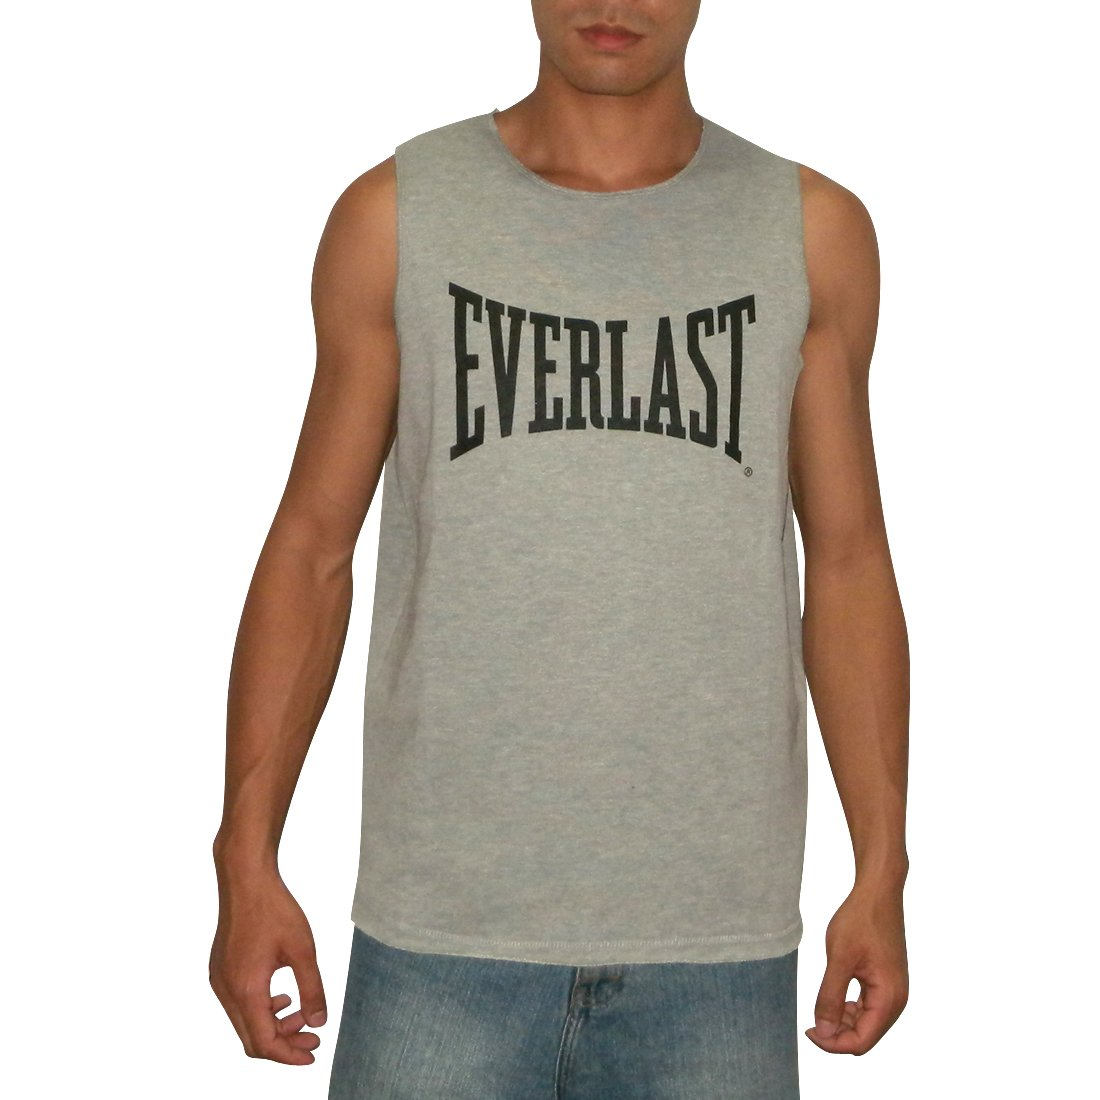 5e36a77cb776d Everlast mens athletic crew neck sleeveless sweatshirt vest size clothing  jpg 1100x1100 Everlast sleeveless tee